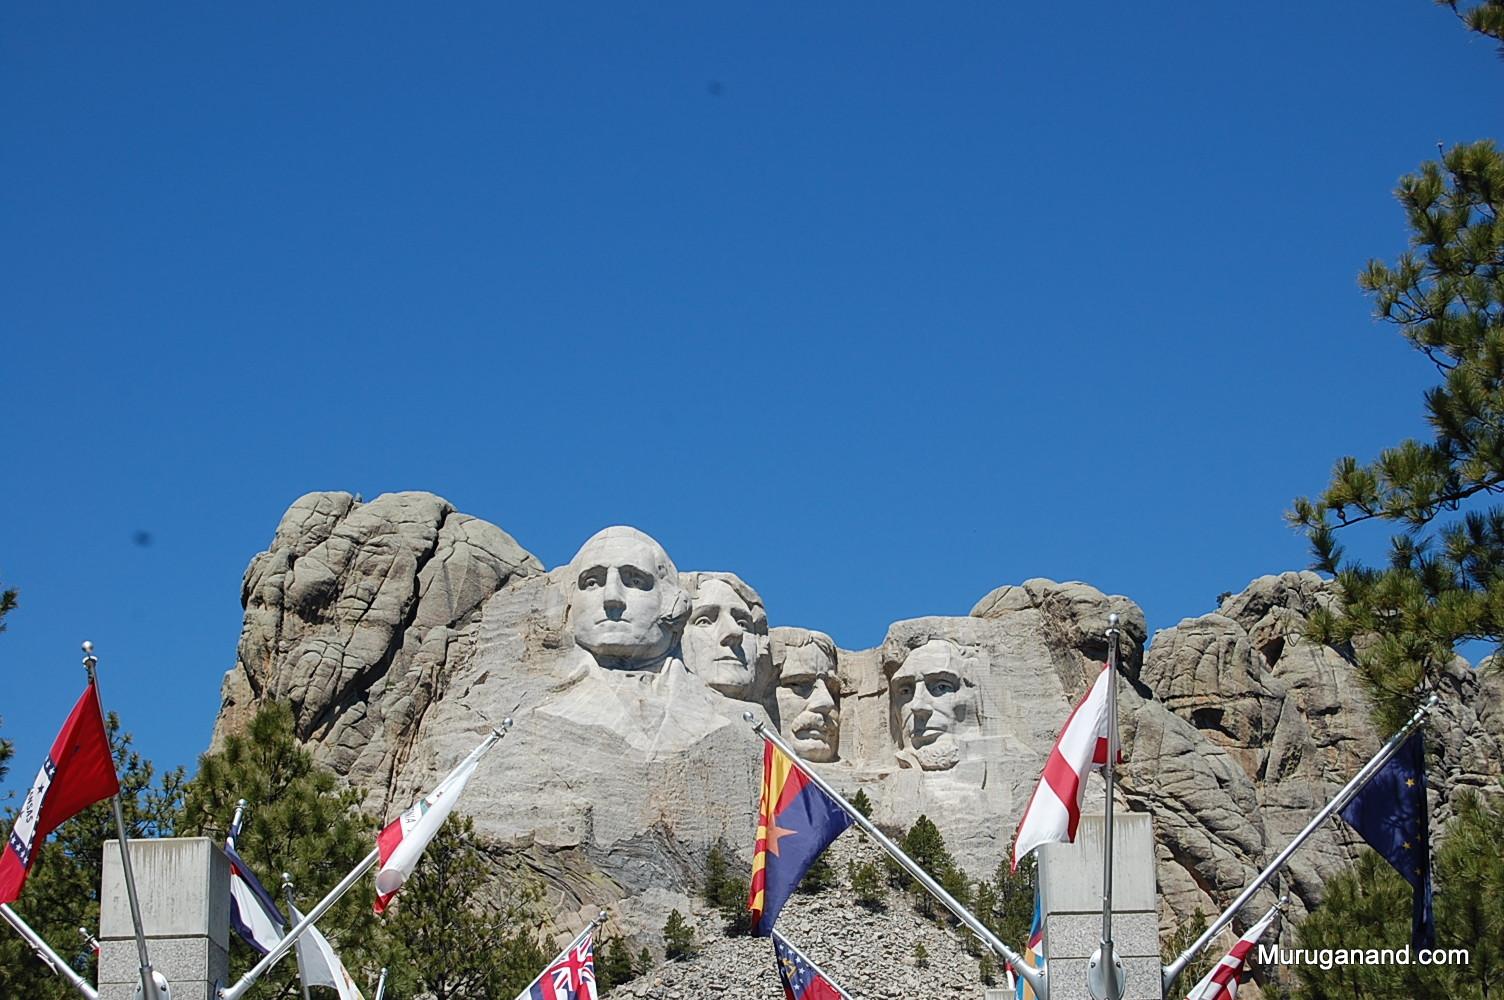 Washington, Jefferson, Roosevelt, Lincoln